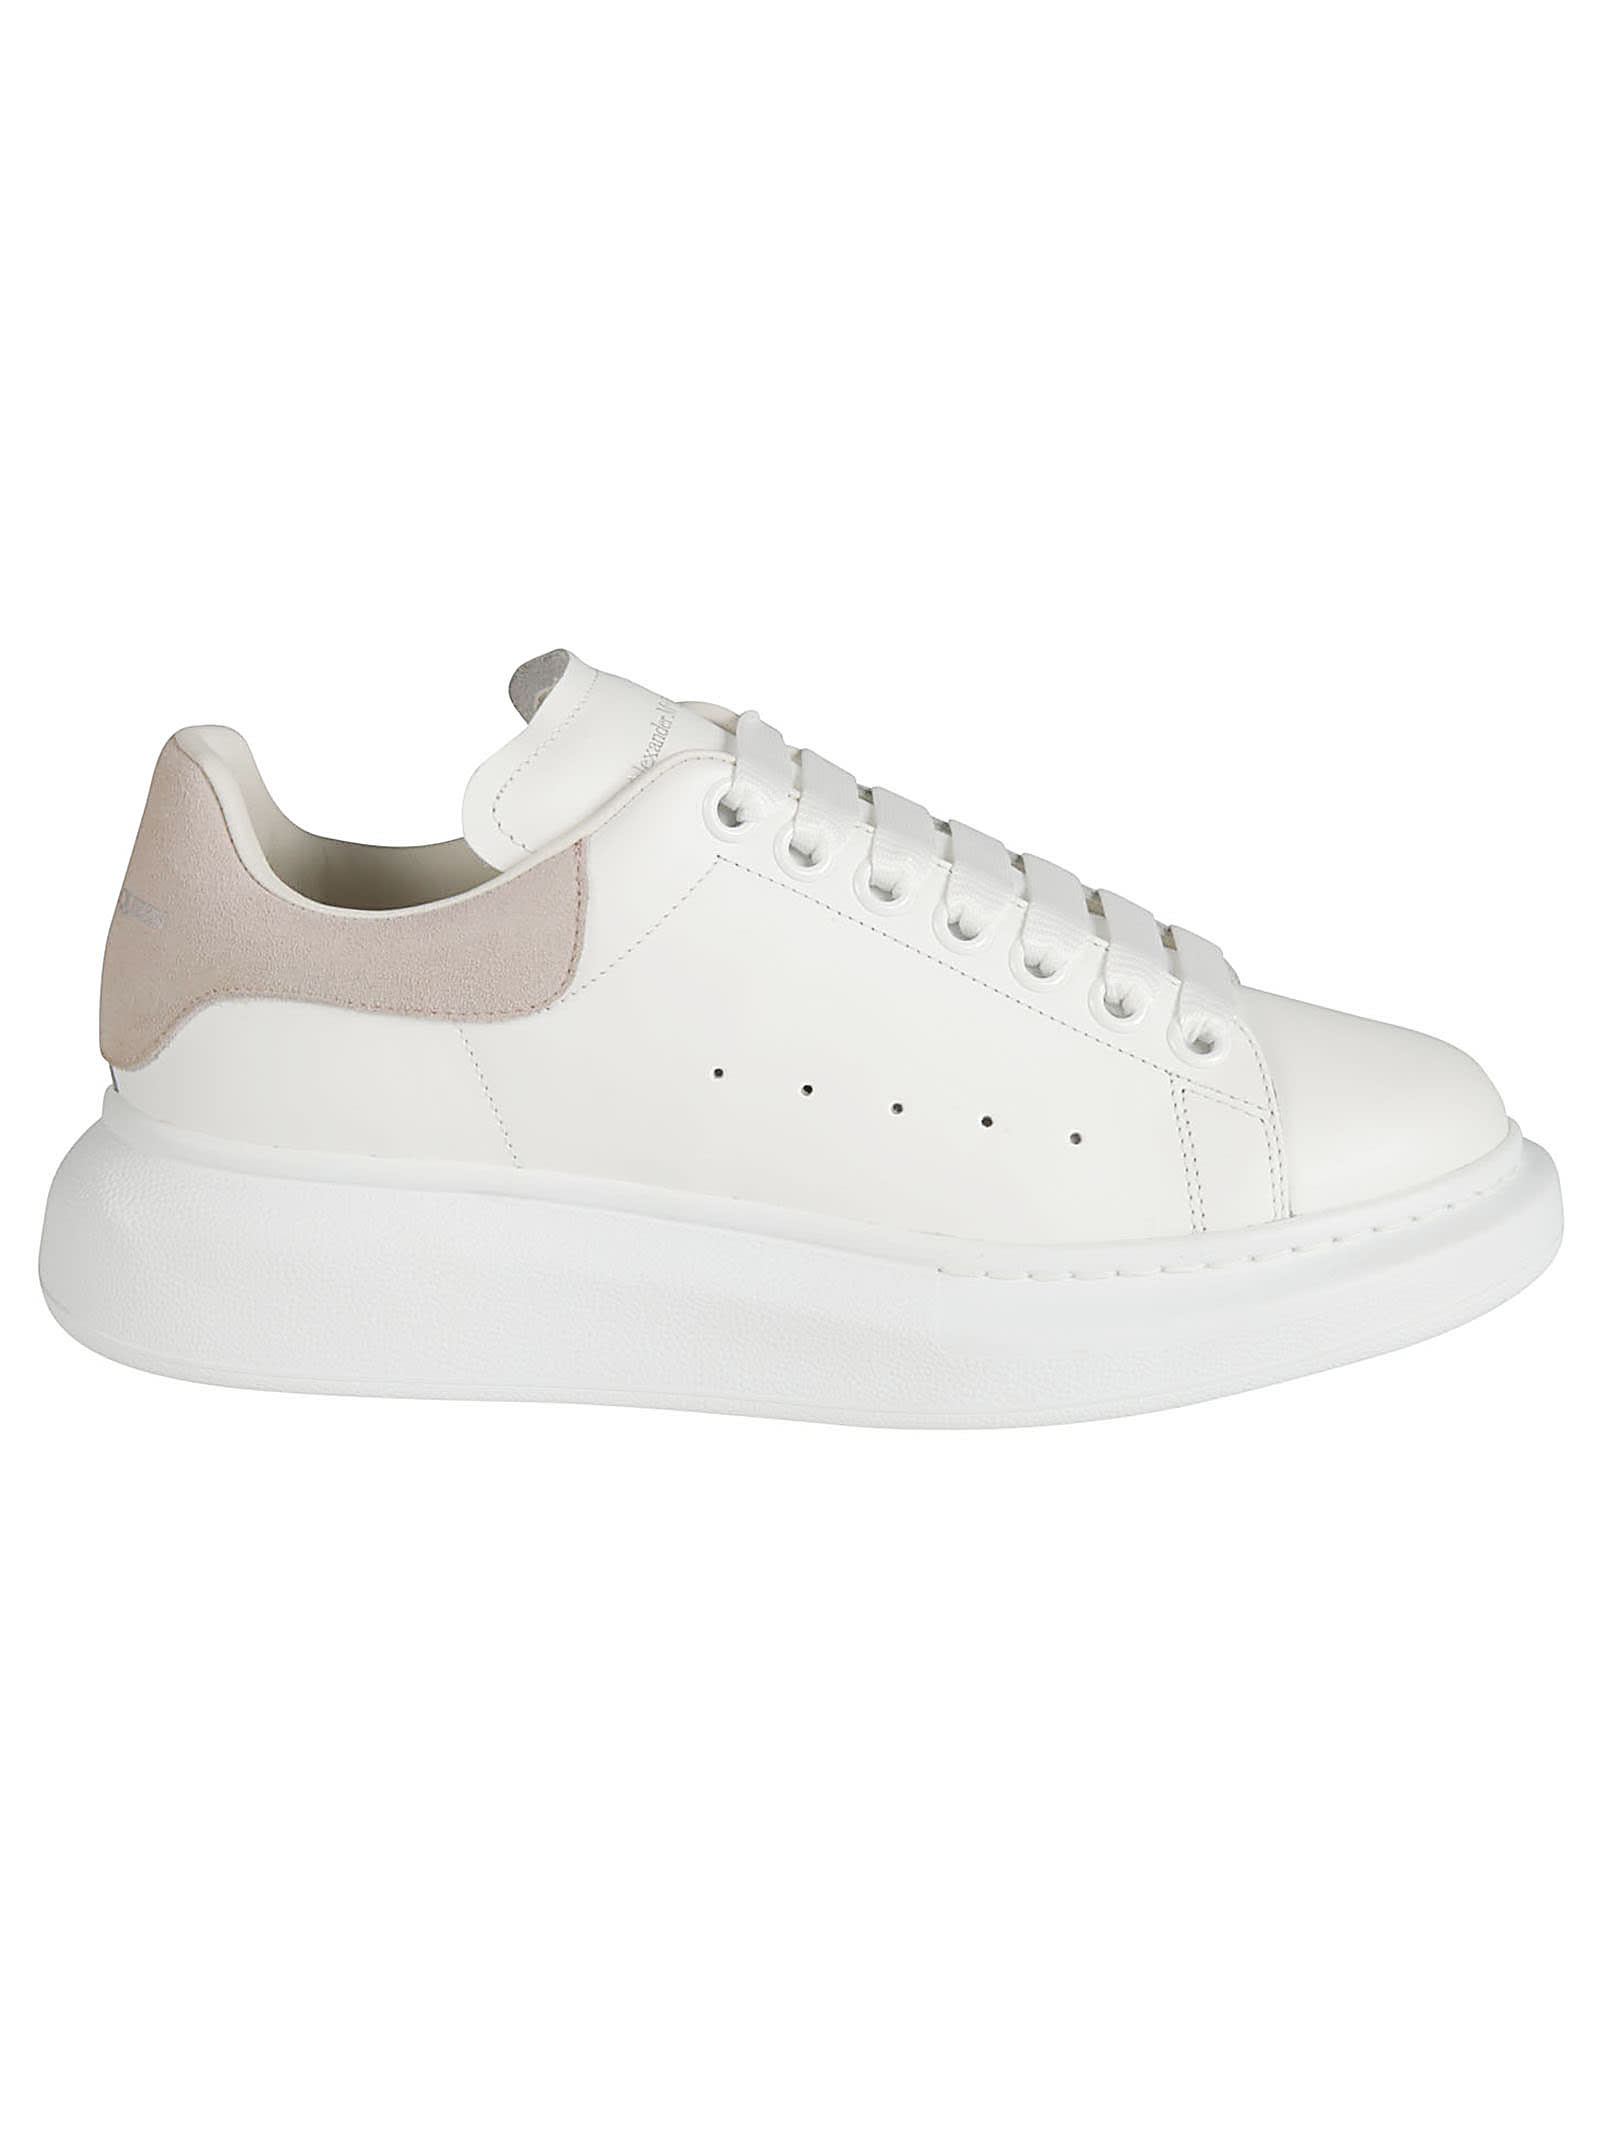 Buy Alexander McQueen Classic Logo Sneakers online, shop Alexander McQueen shoes with free shipping